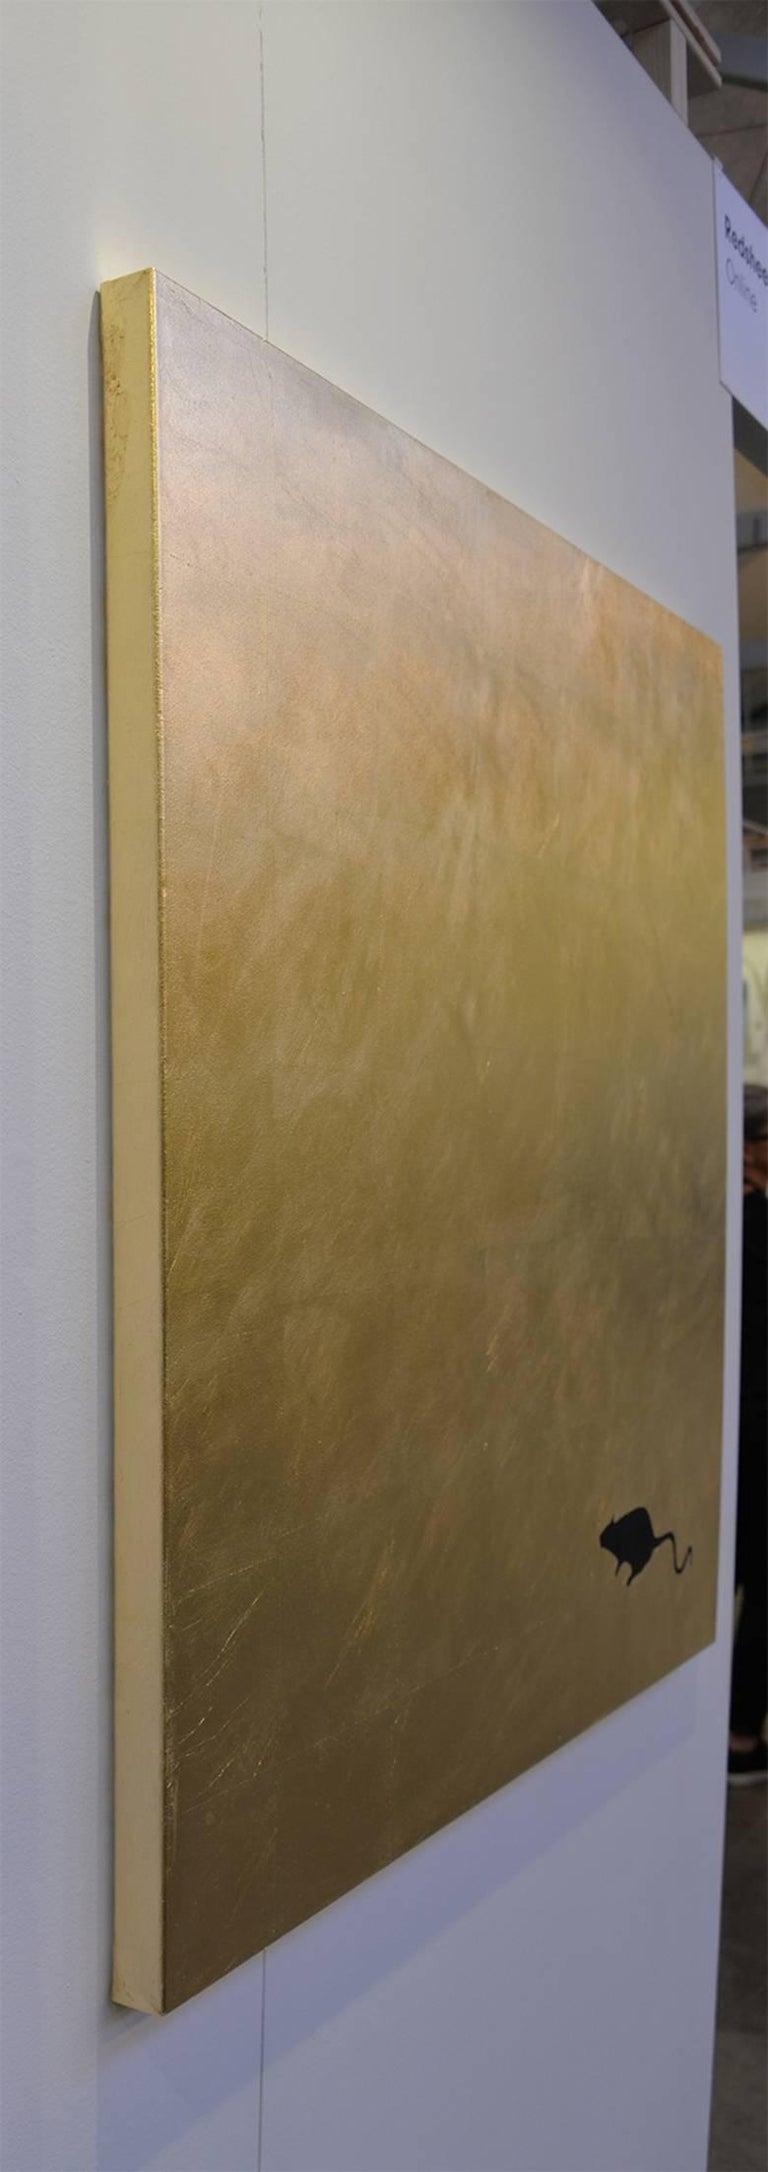 Golden Ratrace - Pop Art Painting by Kerstin Oldal